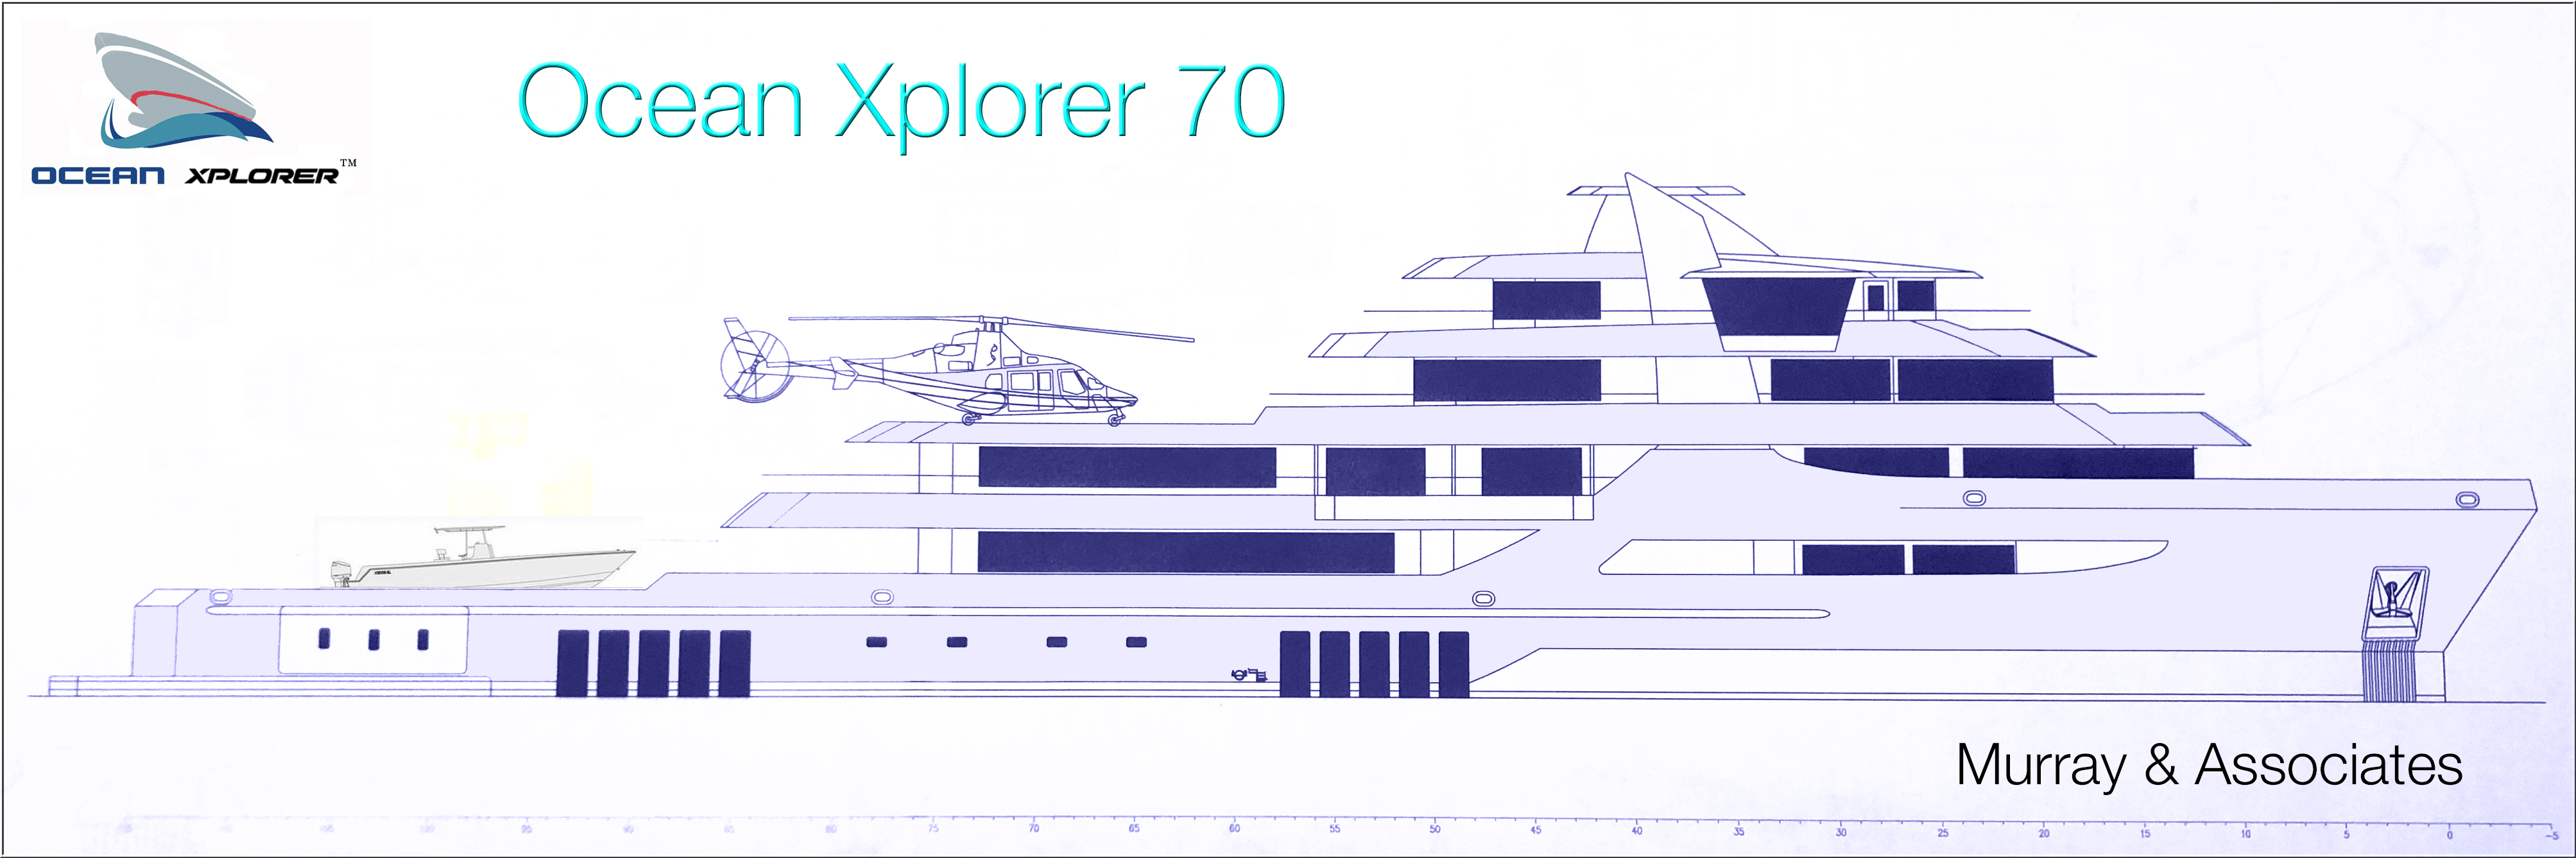 Ocean Xplorer 70 Expedition Yacht